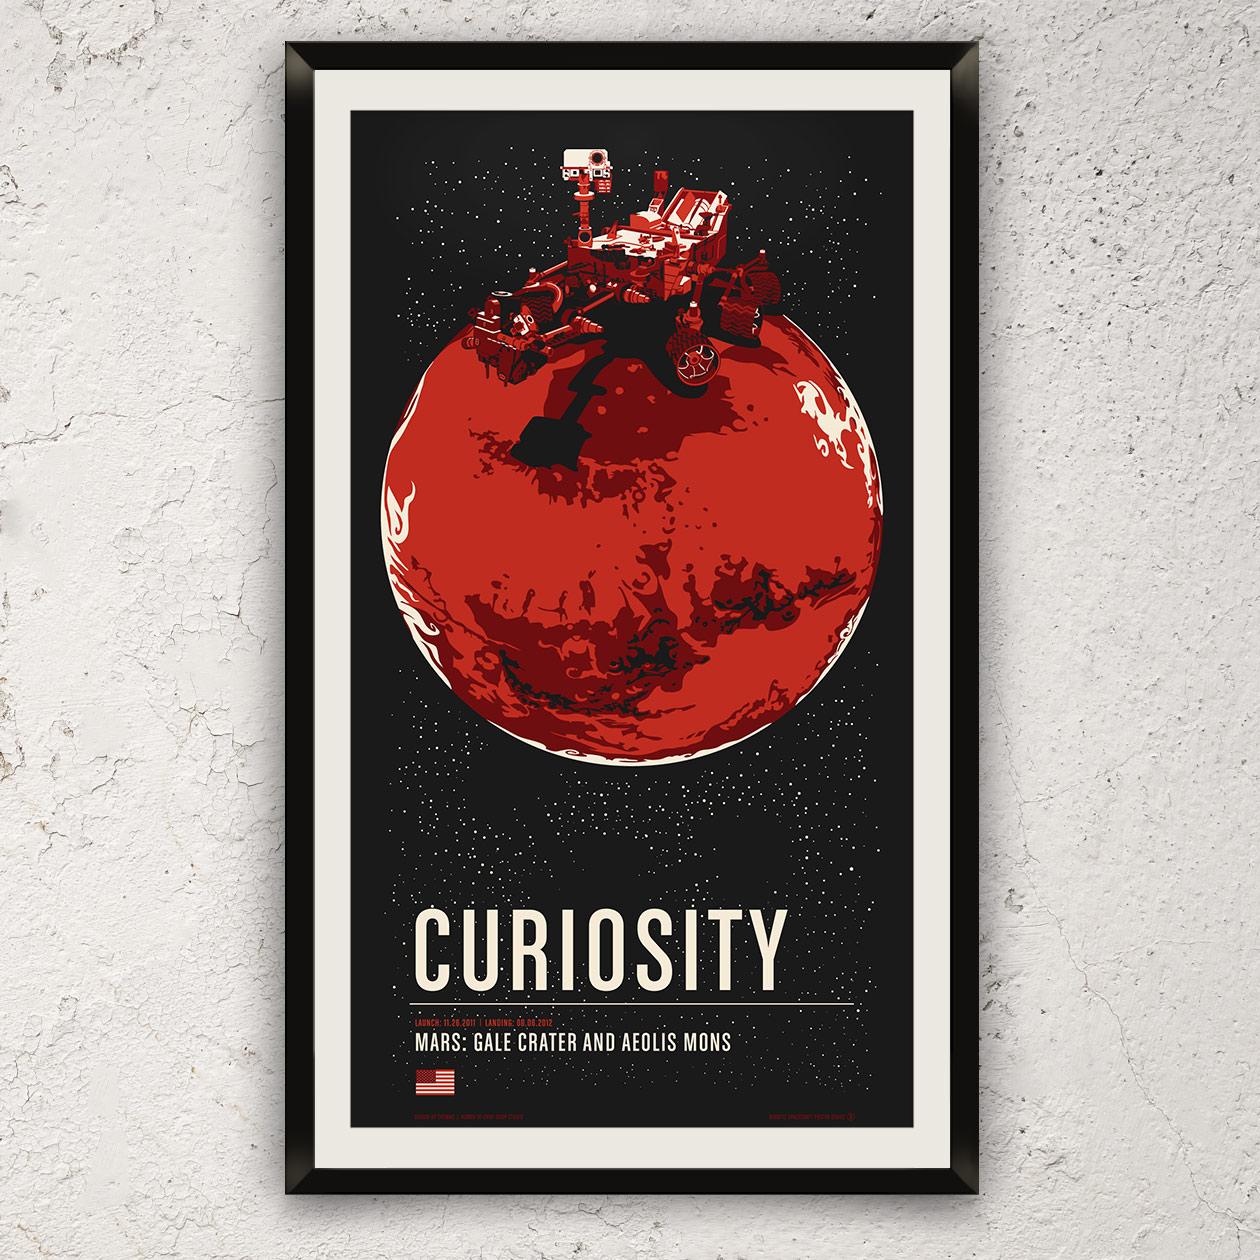 hrss-curiosity-main-1260.jpg